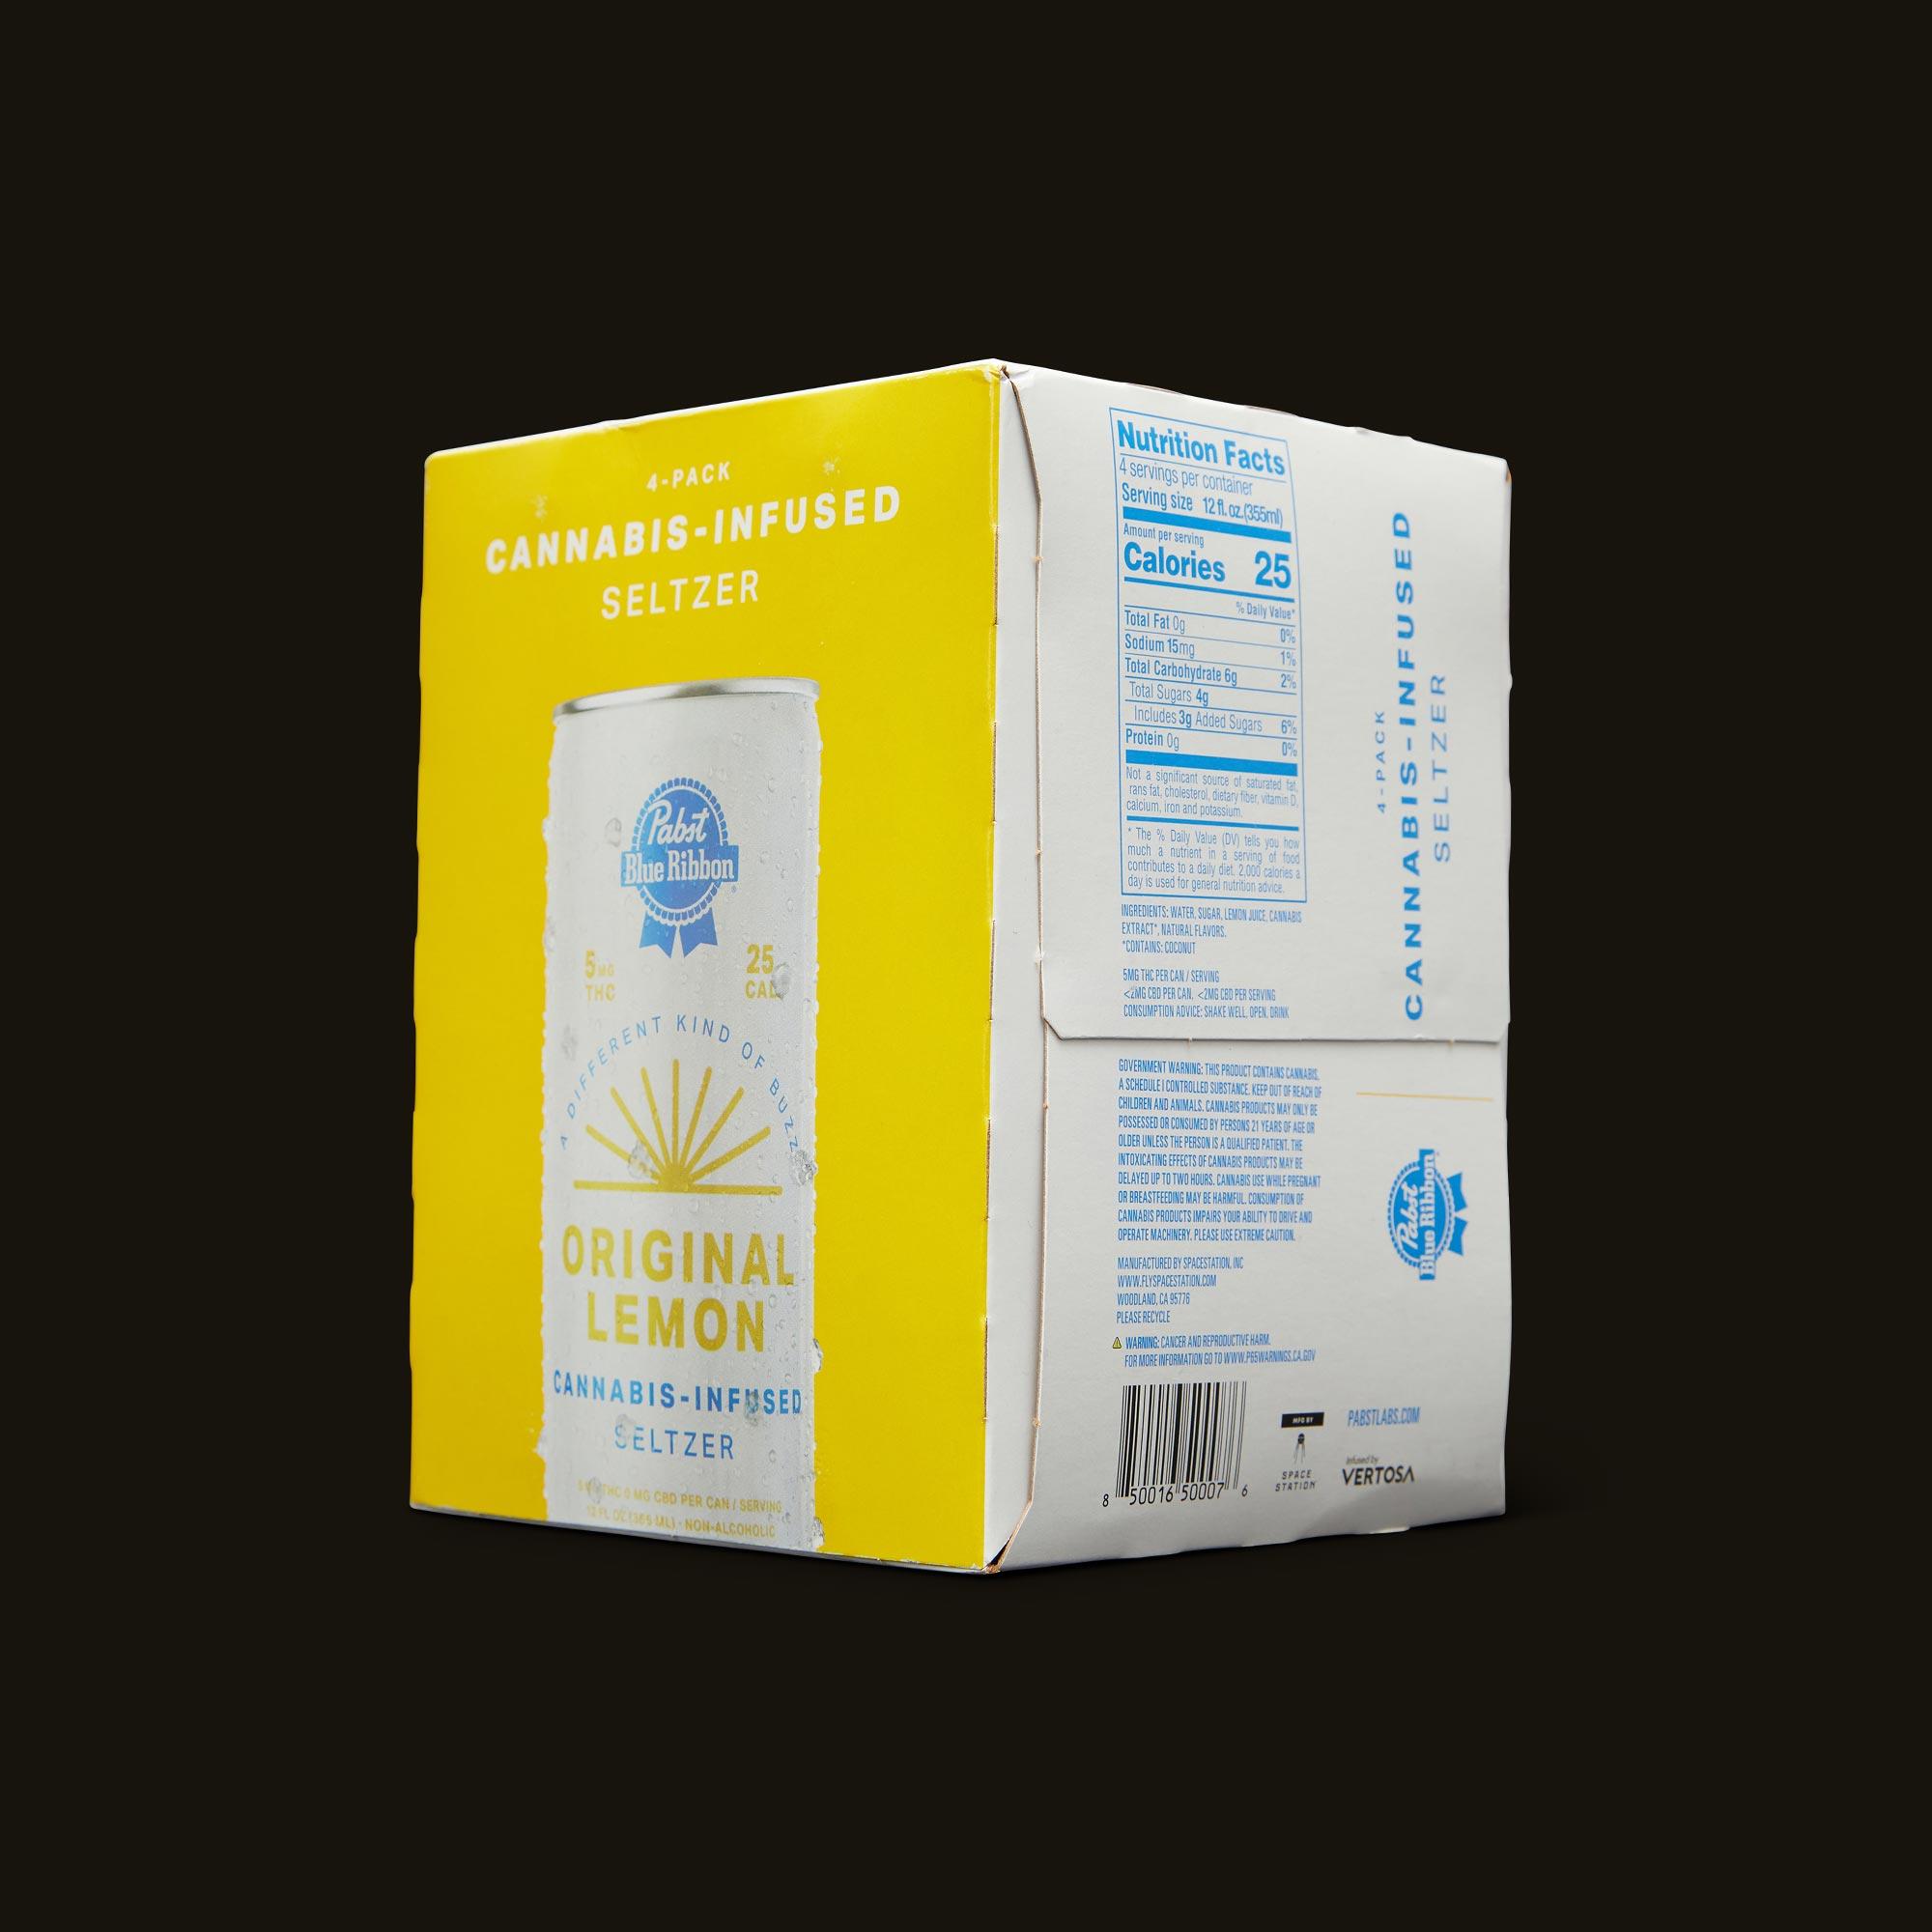 Pabst Blue Ribbon Original Lemon Seltzer Ingredients